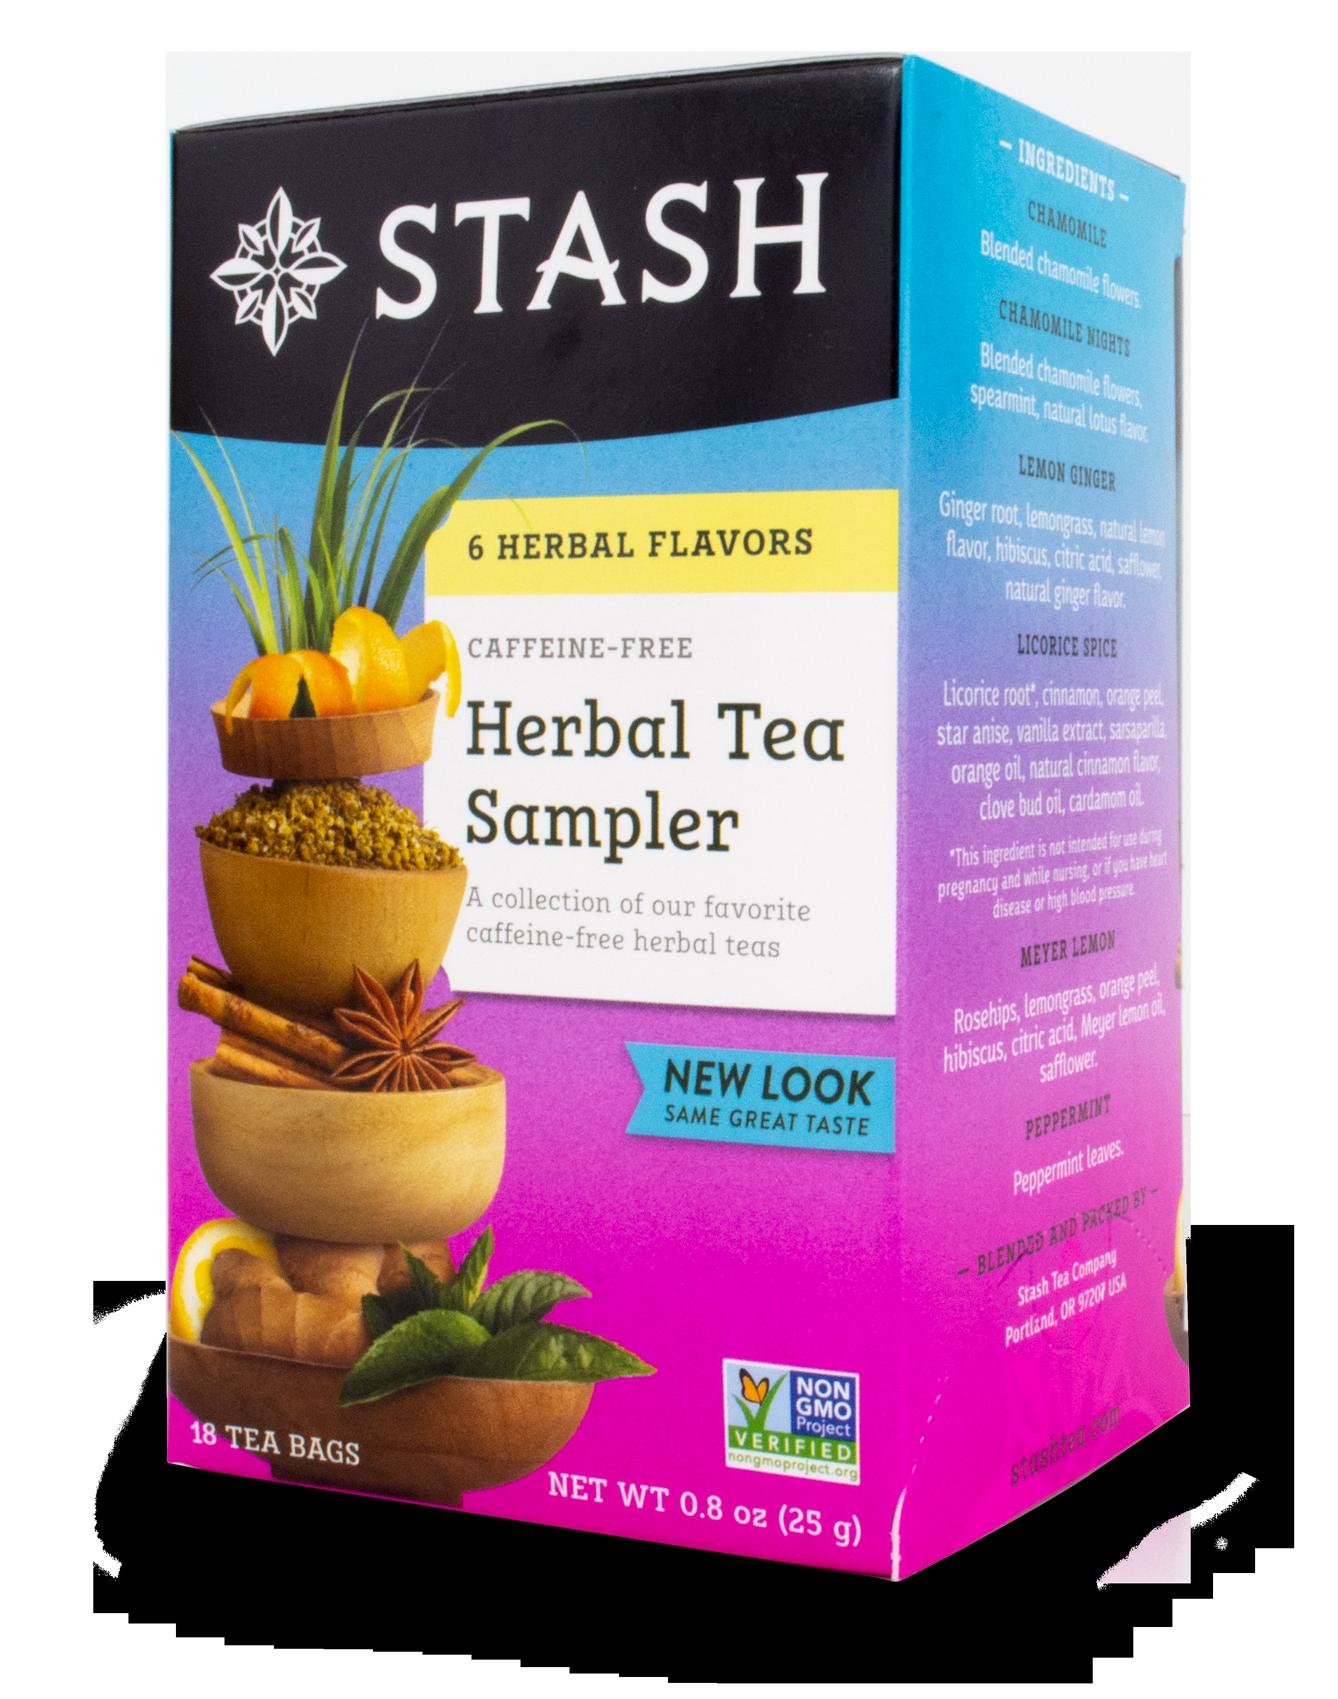 Stash Herbal Sampler